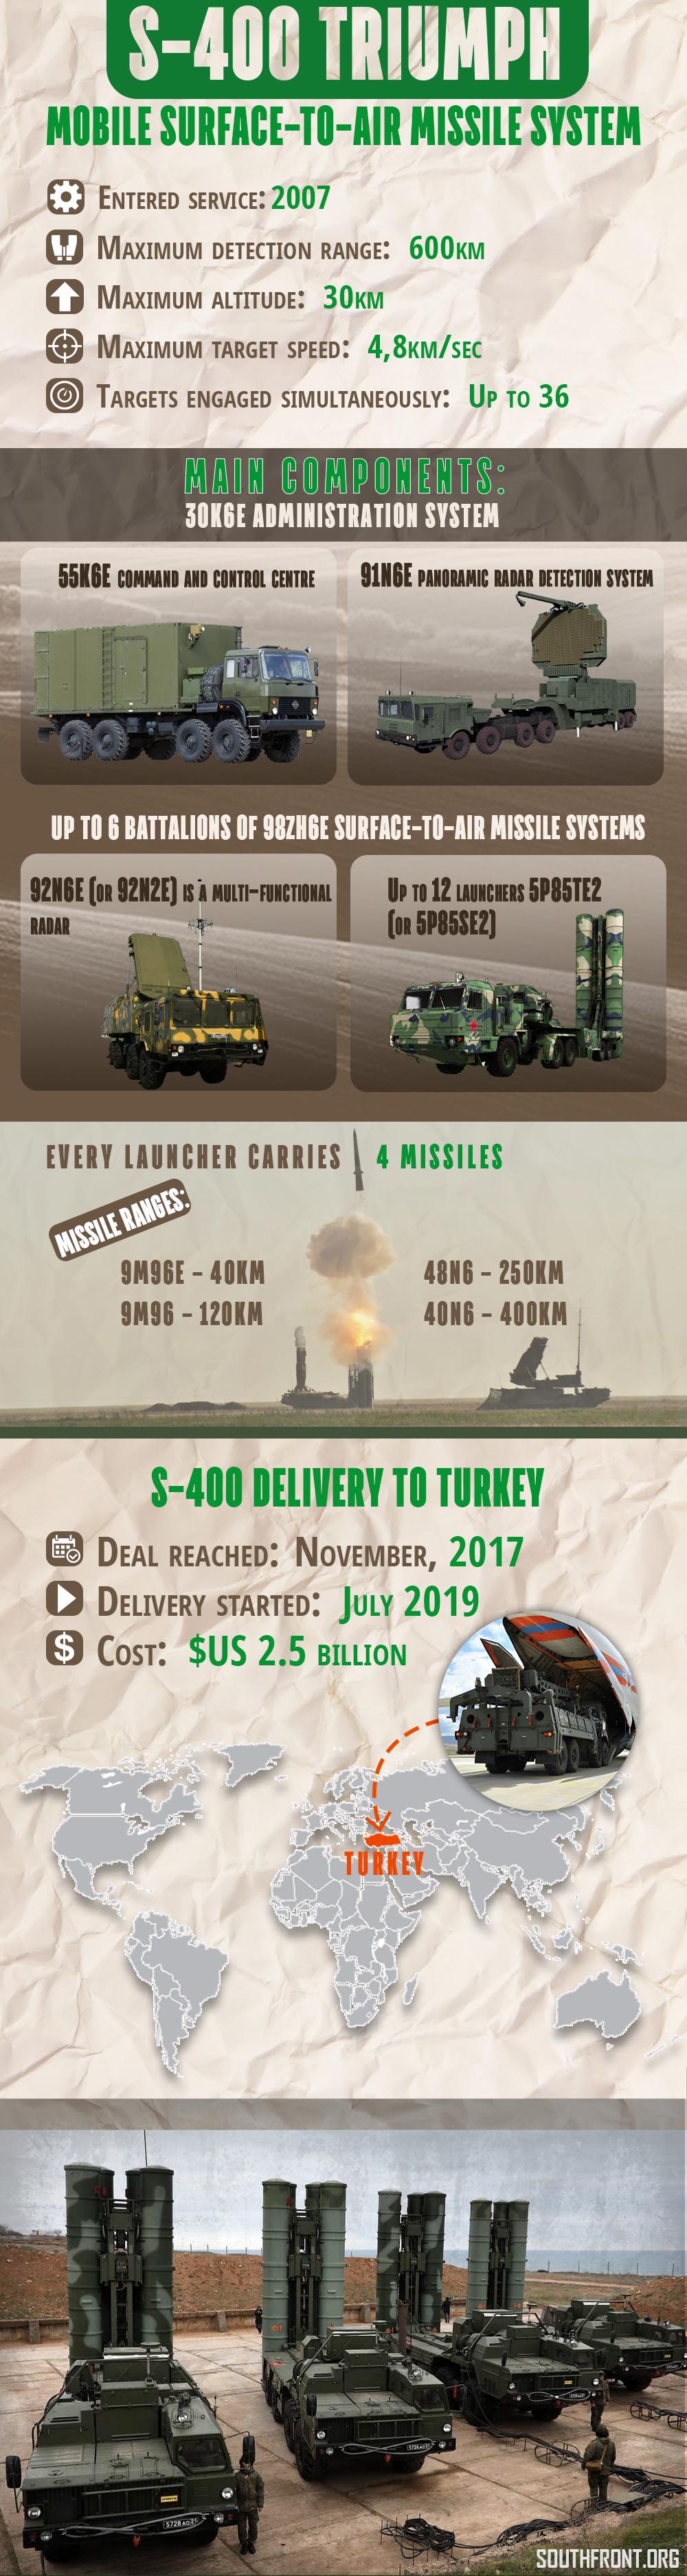 Chicken Kiev Meets Cold Turkey: Black Sea Axis Emerges?